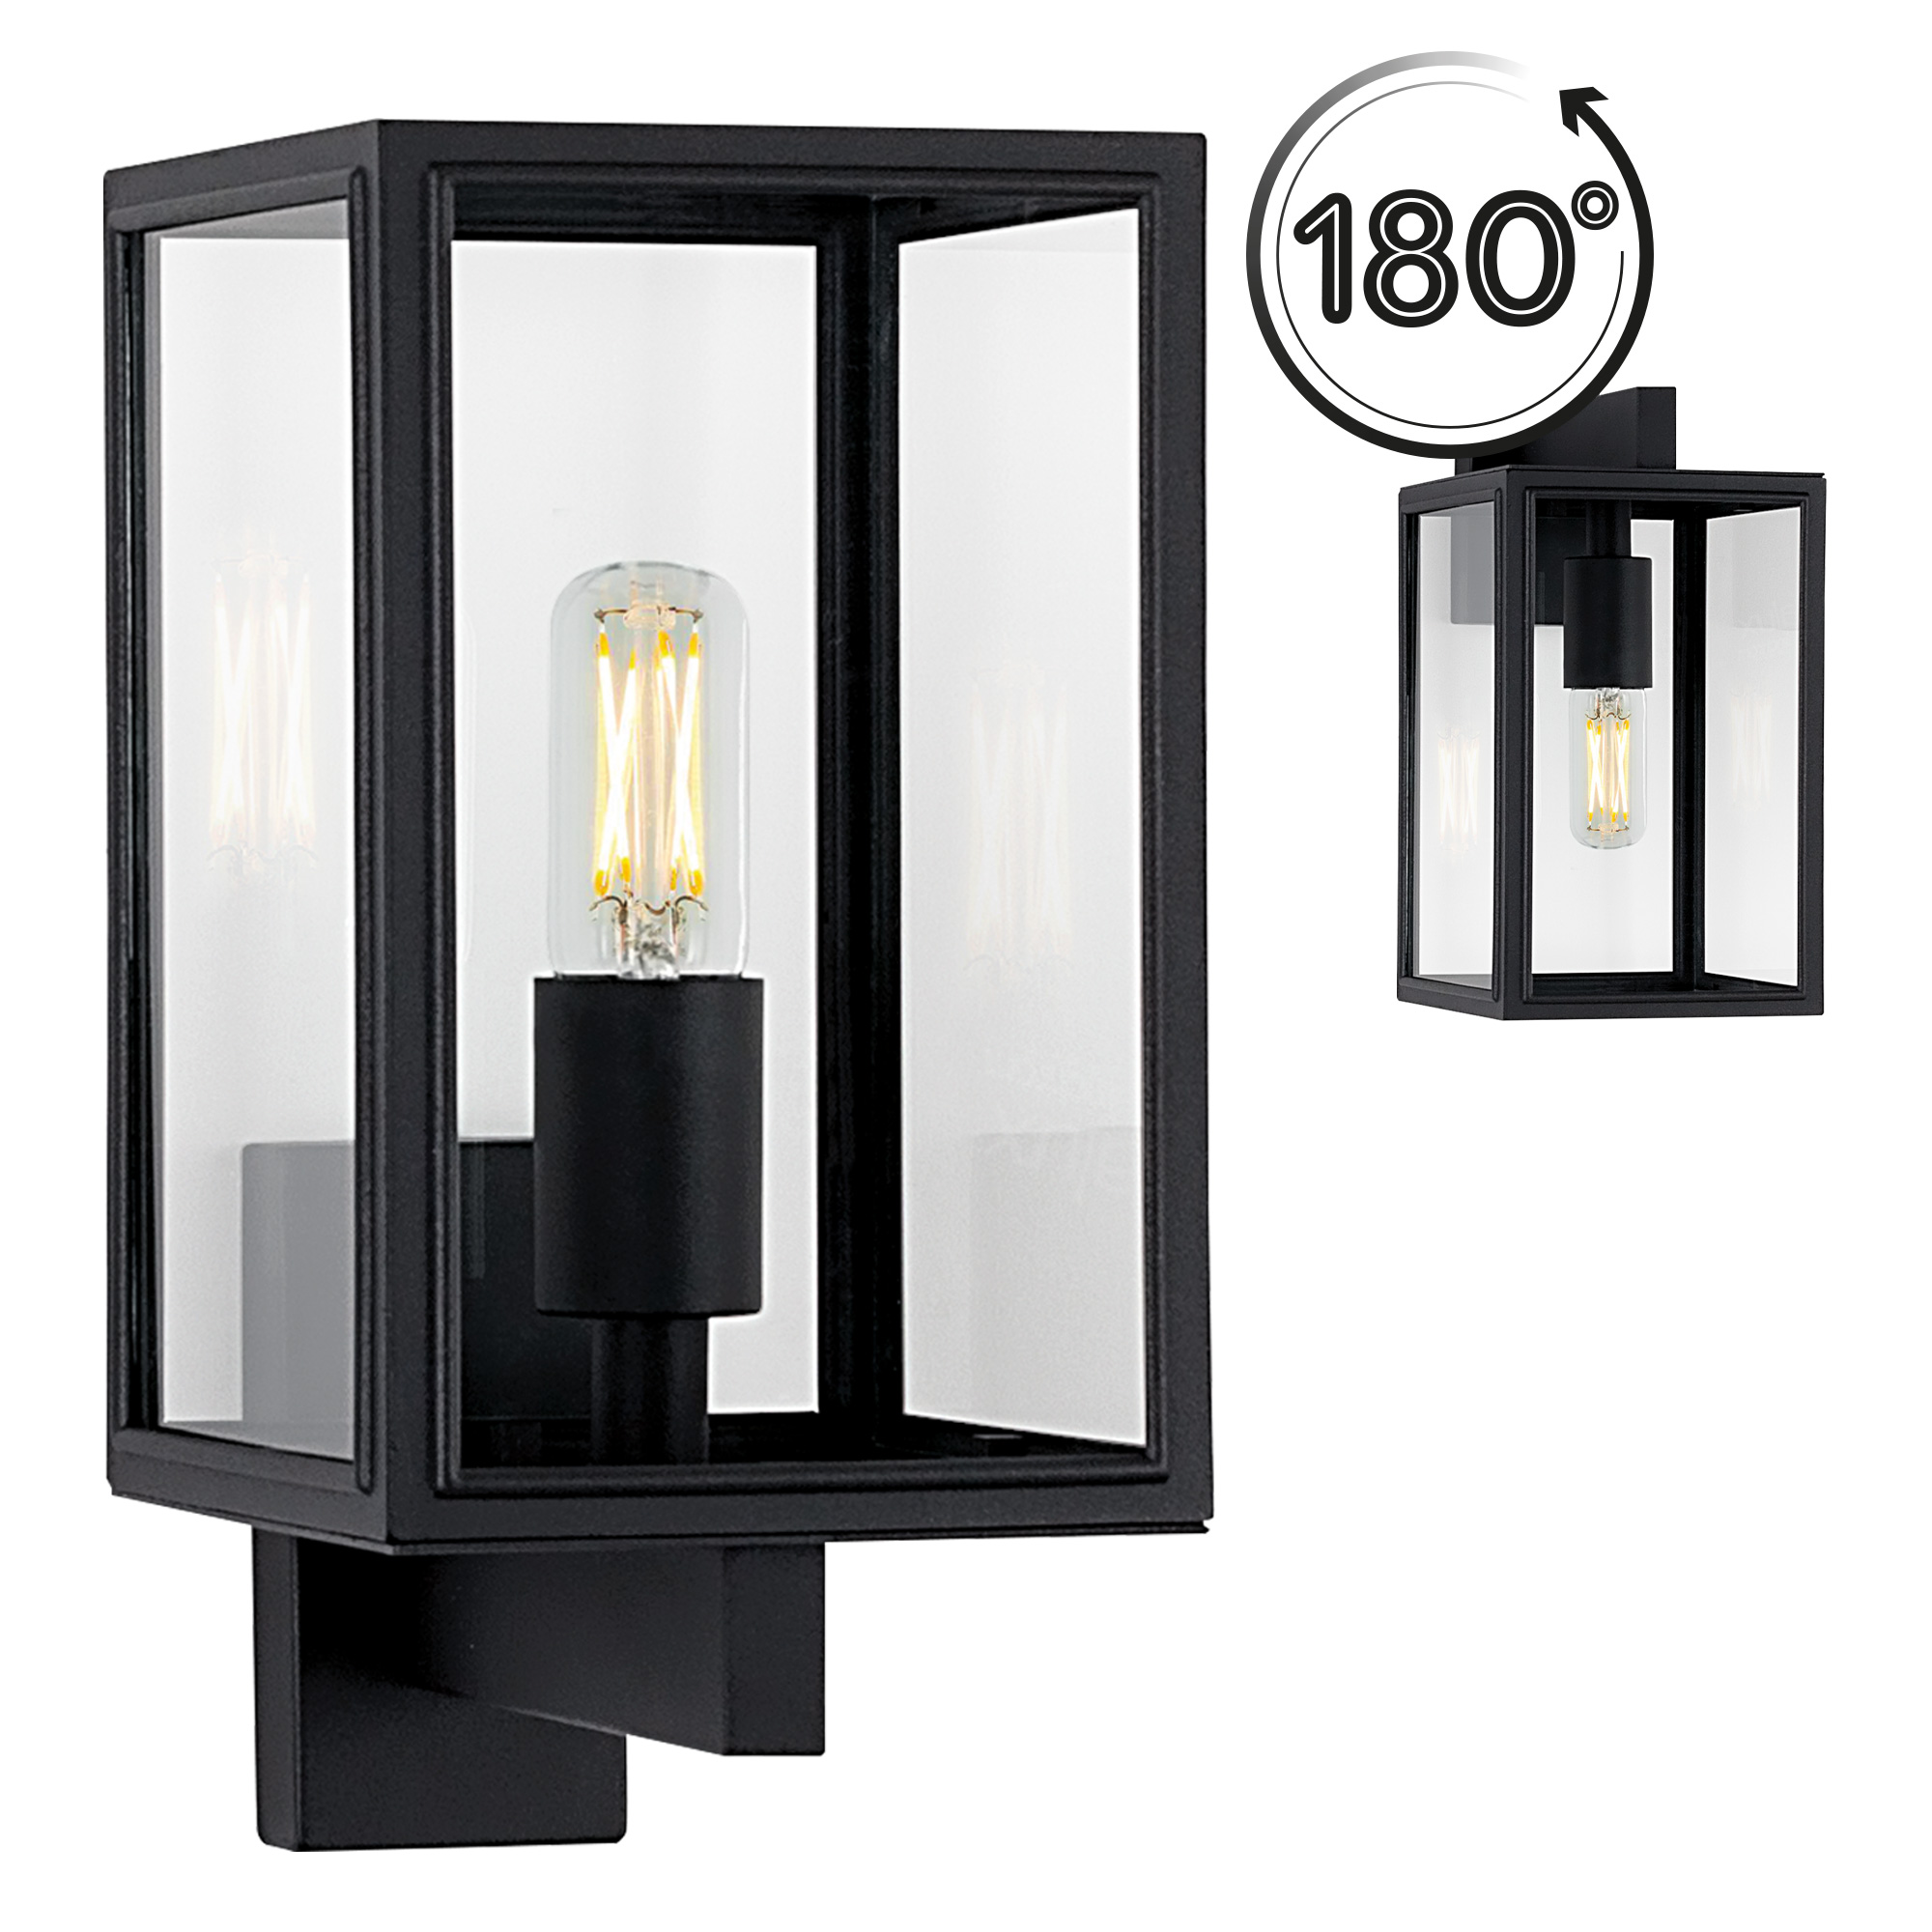 Buitenlamp Soho Zwart